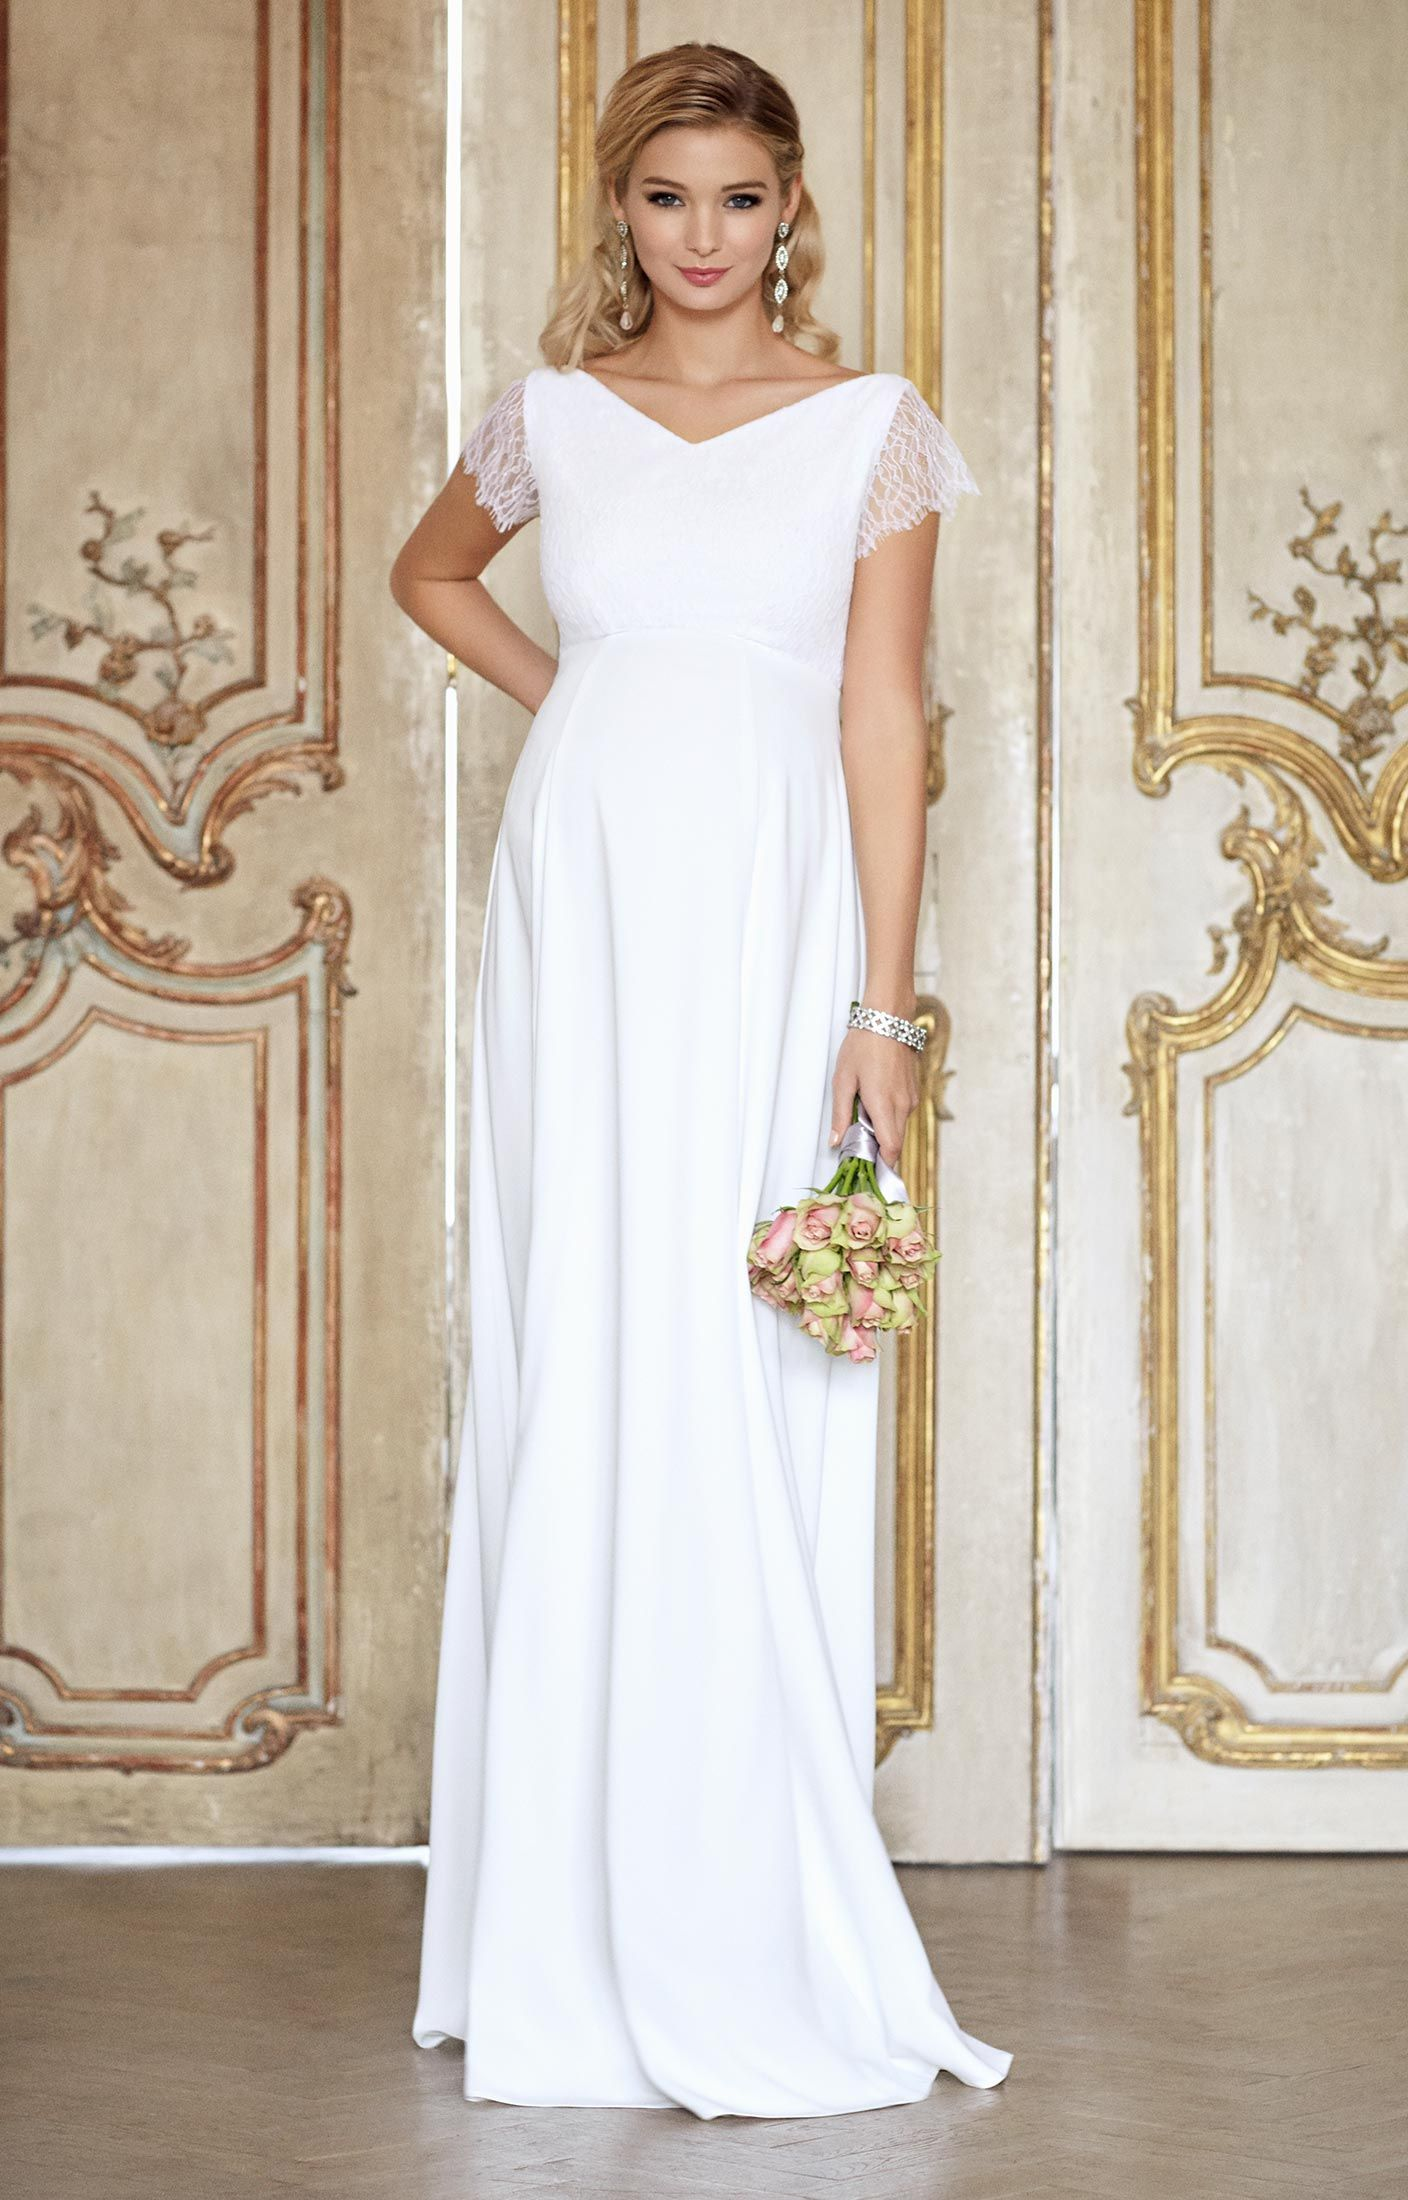 Eleanor Maternity Wedding Gown (Ivory White) - Maternity Wedding